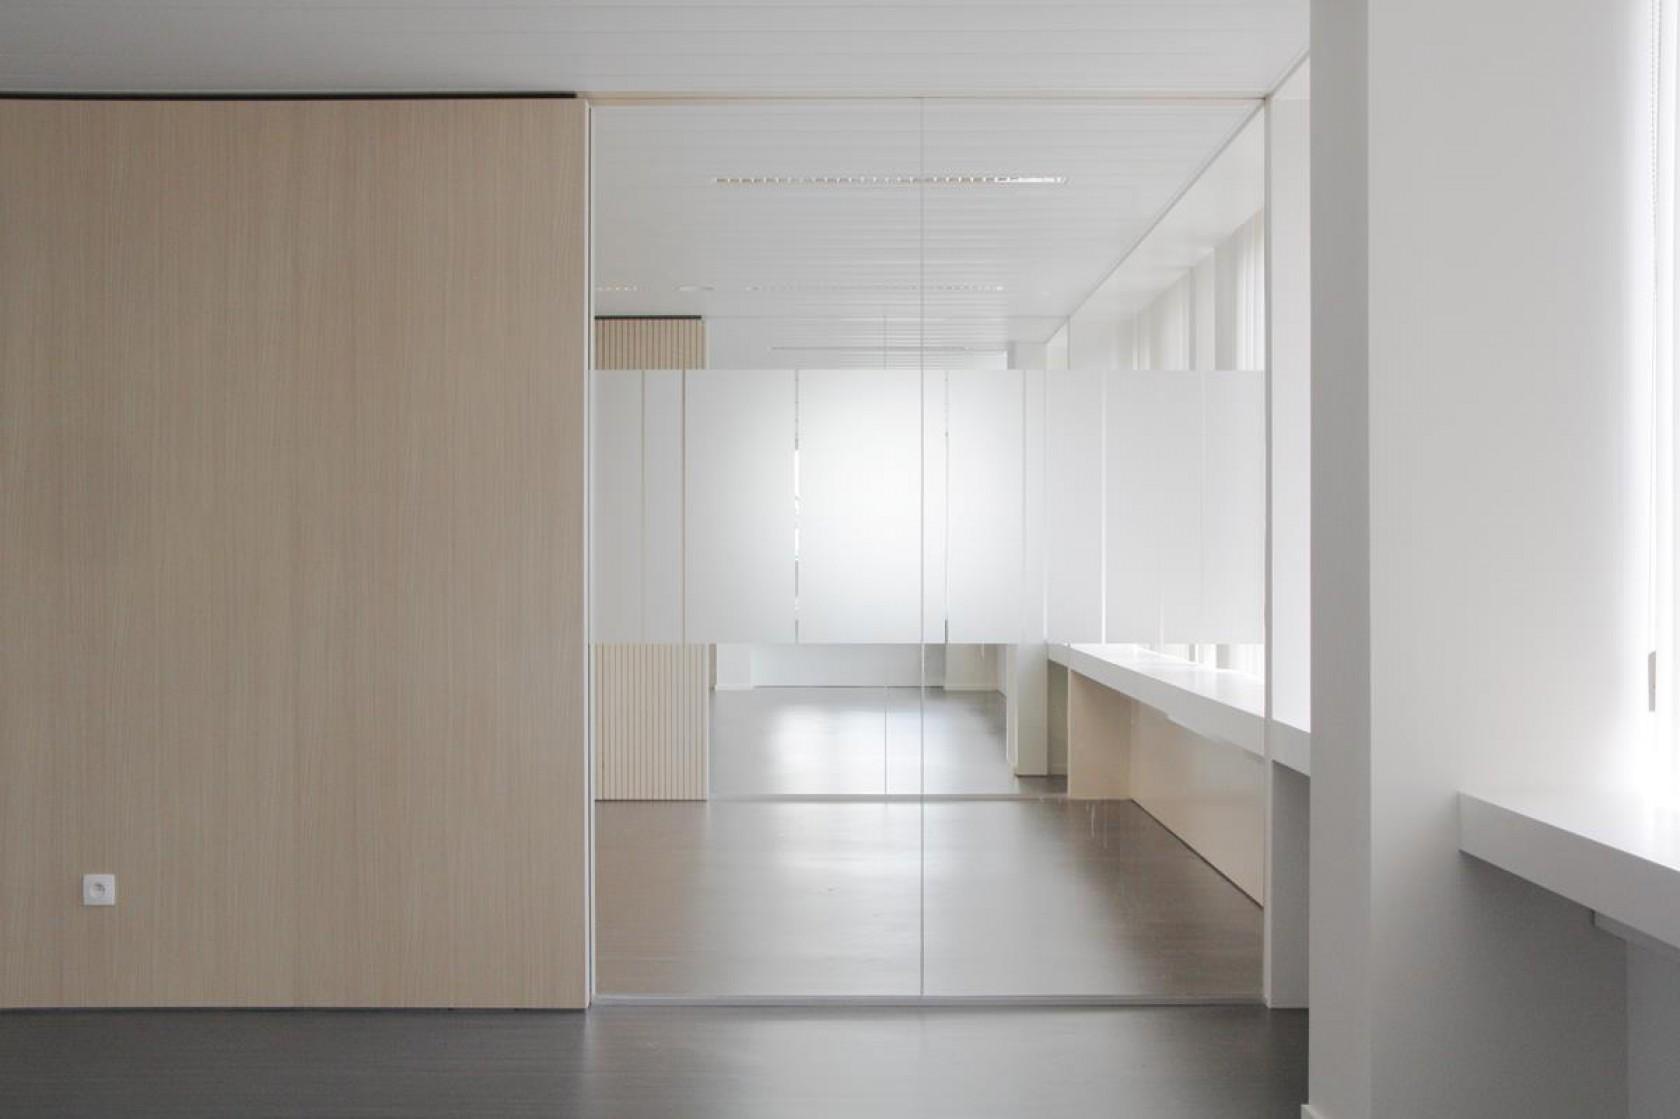 Abscis Architecten - open transparante werkplekken langs de gevels